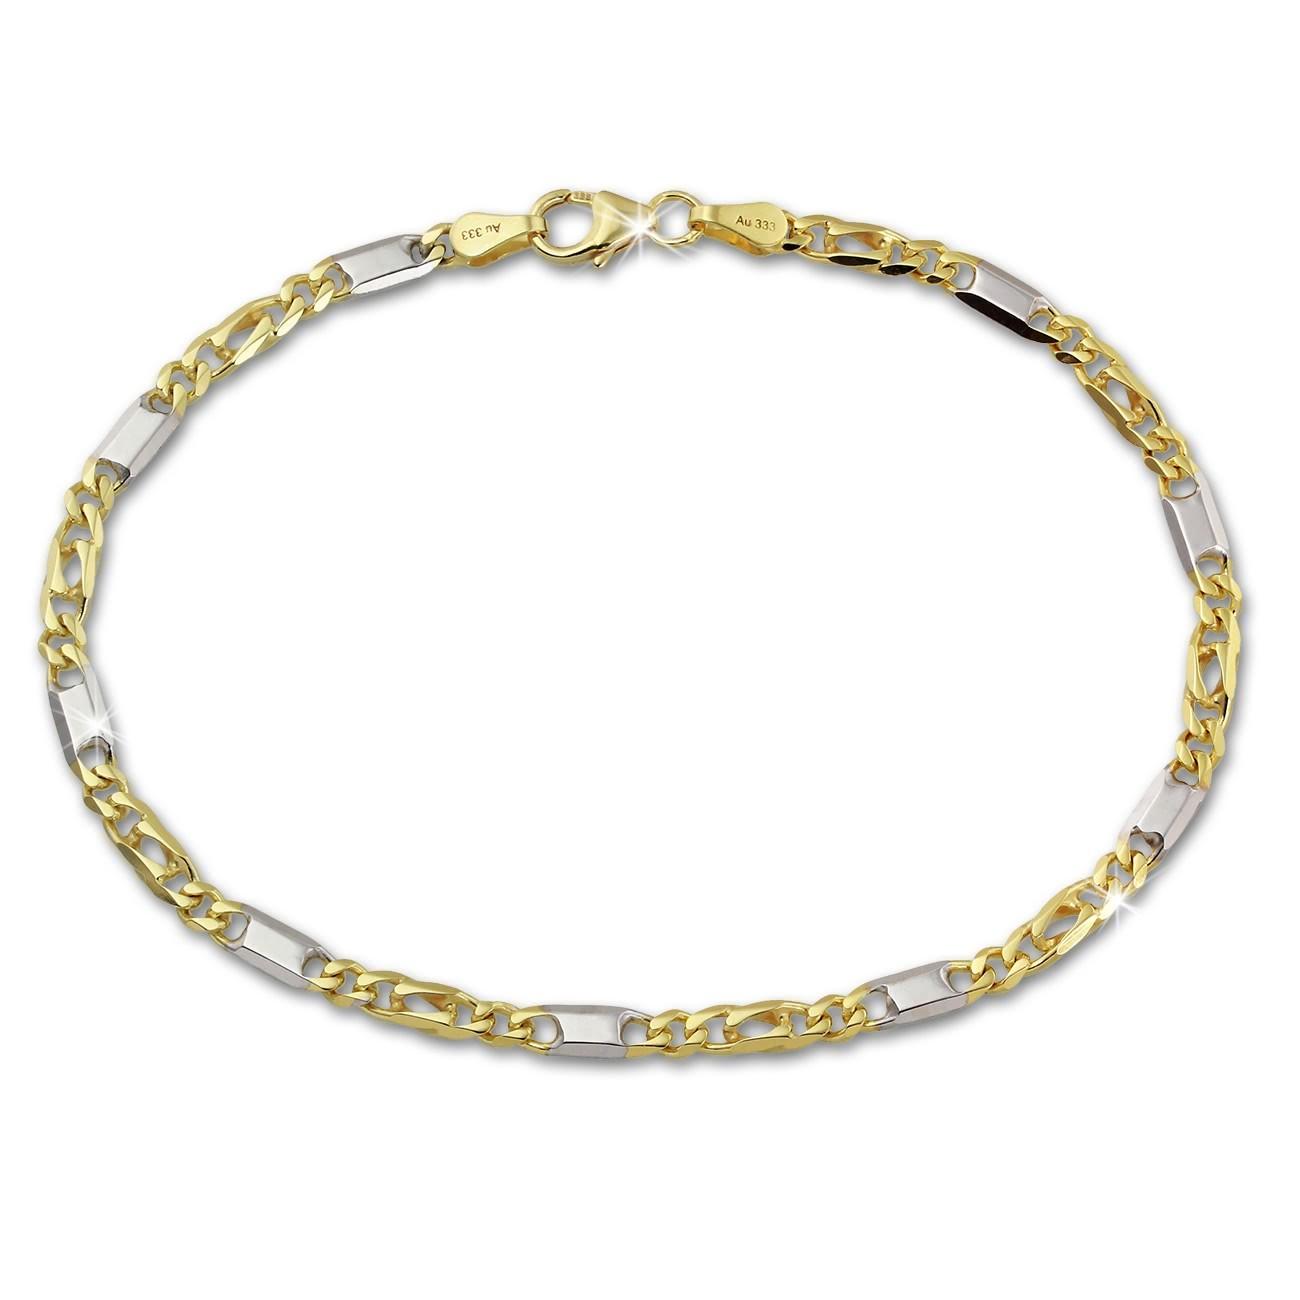 SilberDream Armband Tigerauge bicolor 333 Gold 19cm 8 Karat GDA0279T